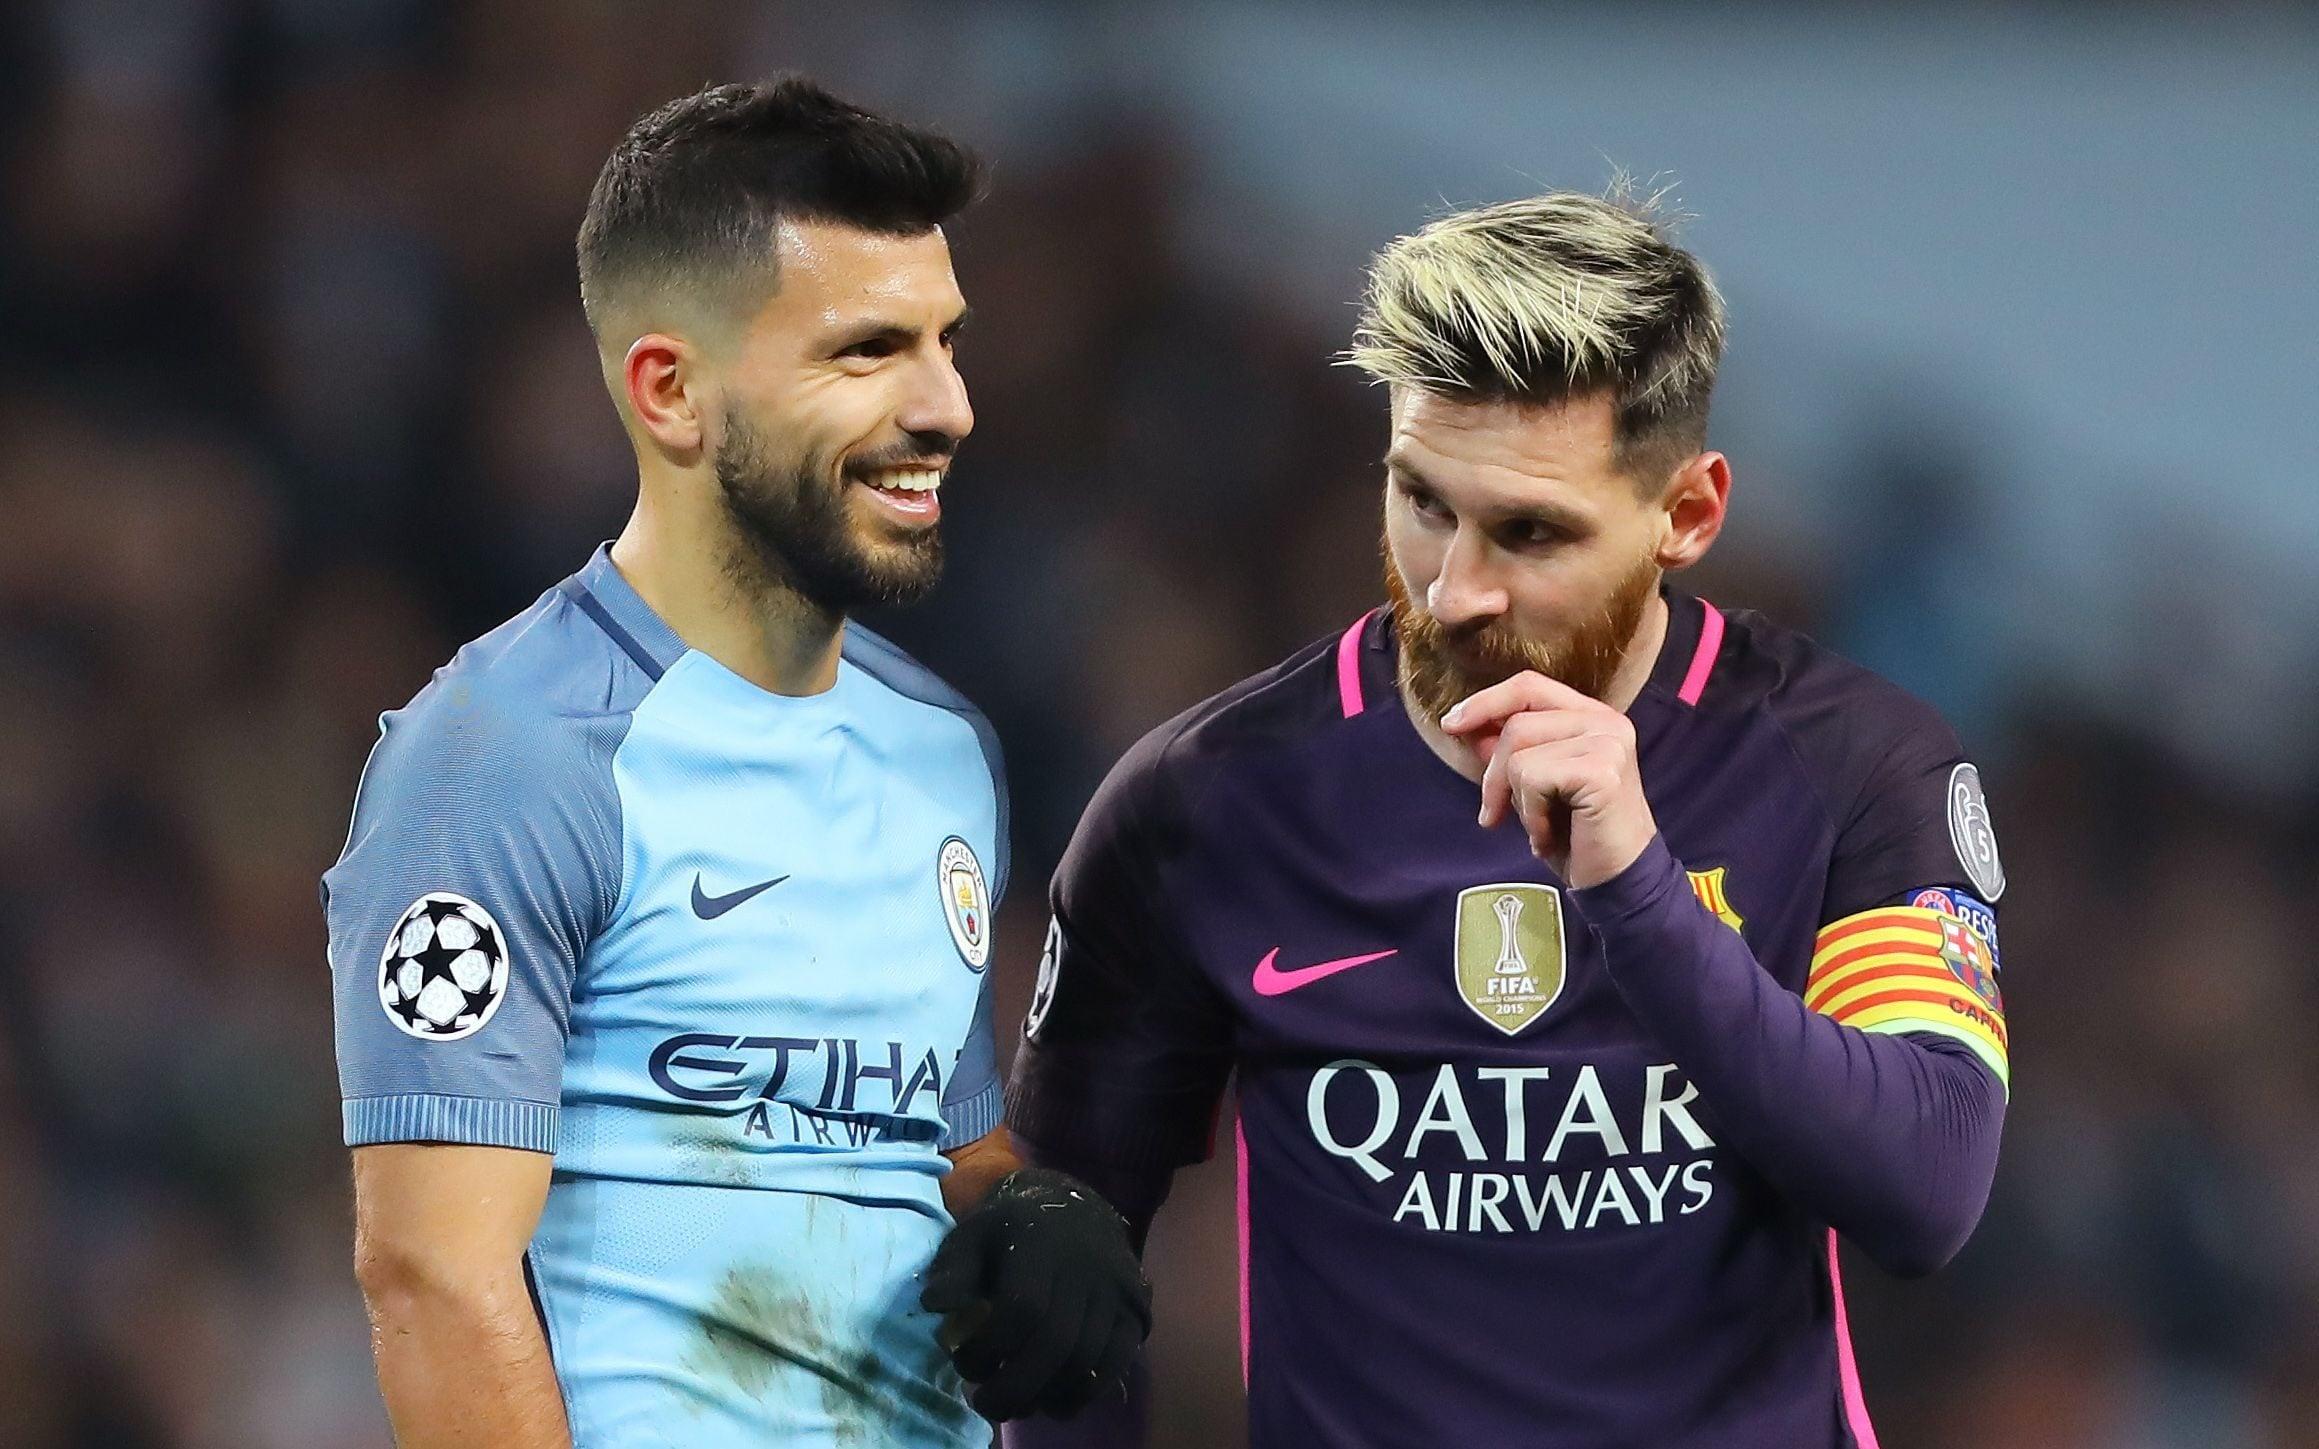 Alasan Aguero Akan Wujudkan Mimpi Satu Klub dengan Messi 5